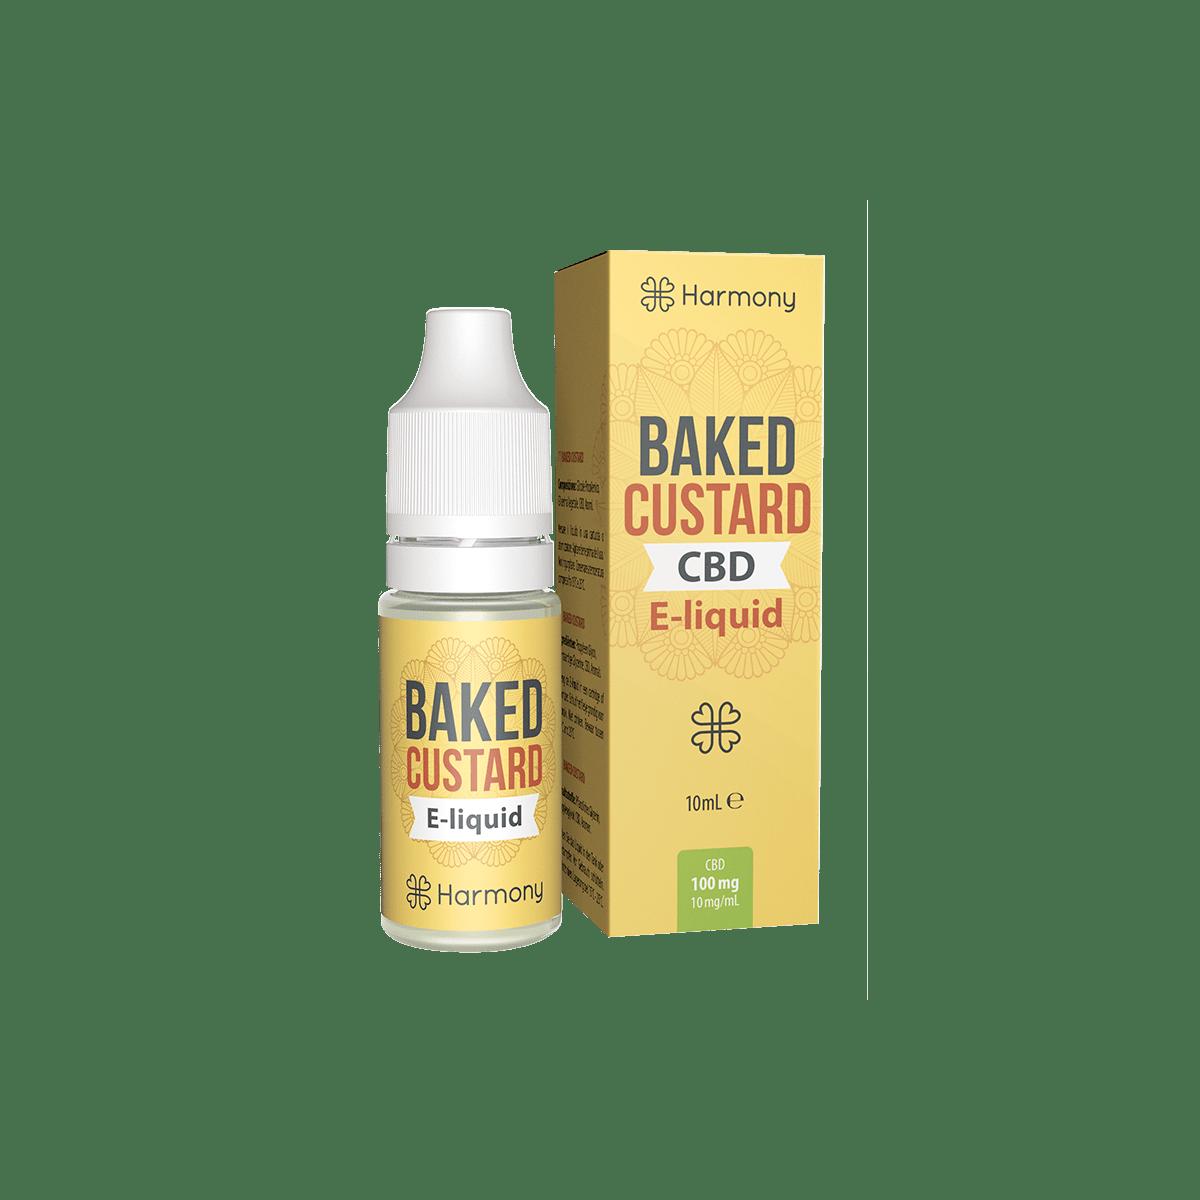 CBD Liquid | HARMONY - Baked Custard | Menge 10 ml - 300 mg im Preisvergleich